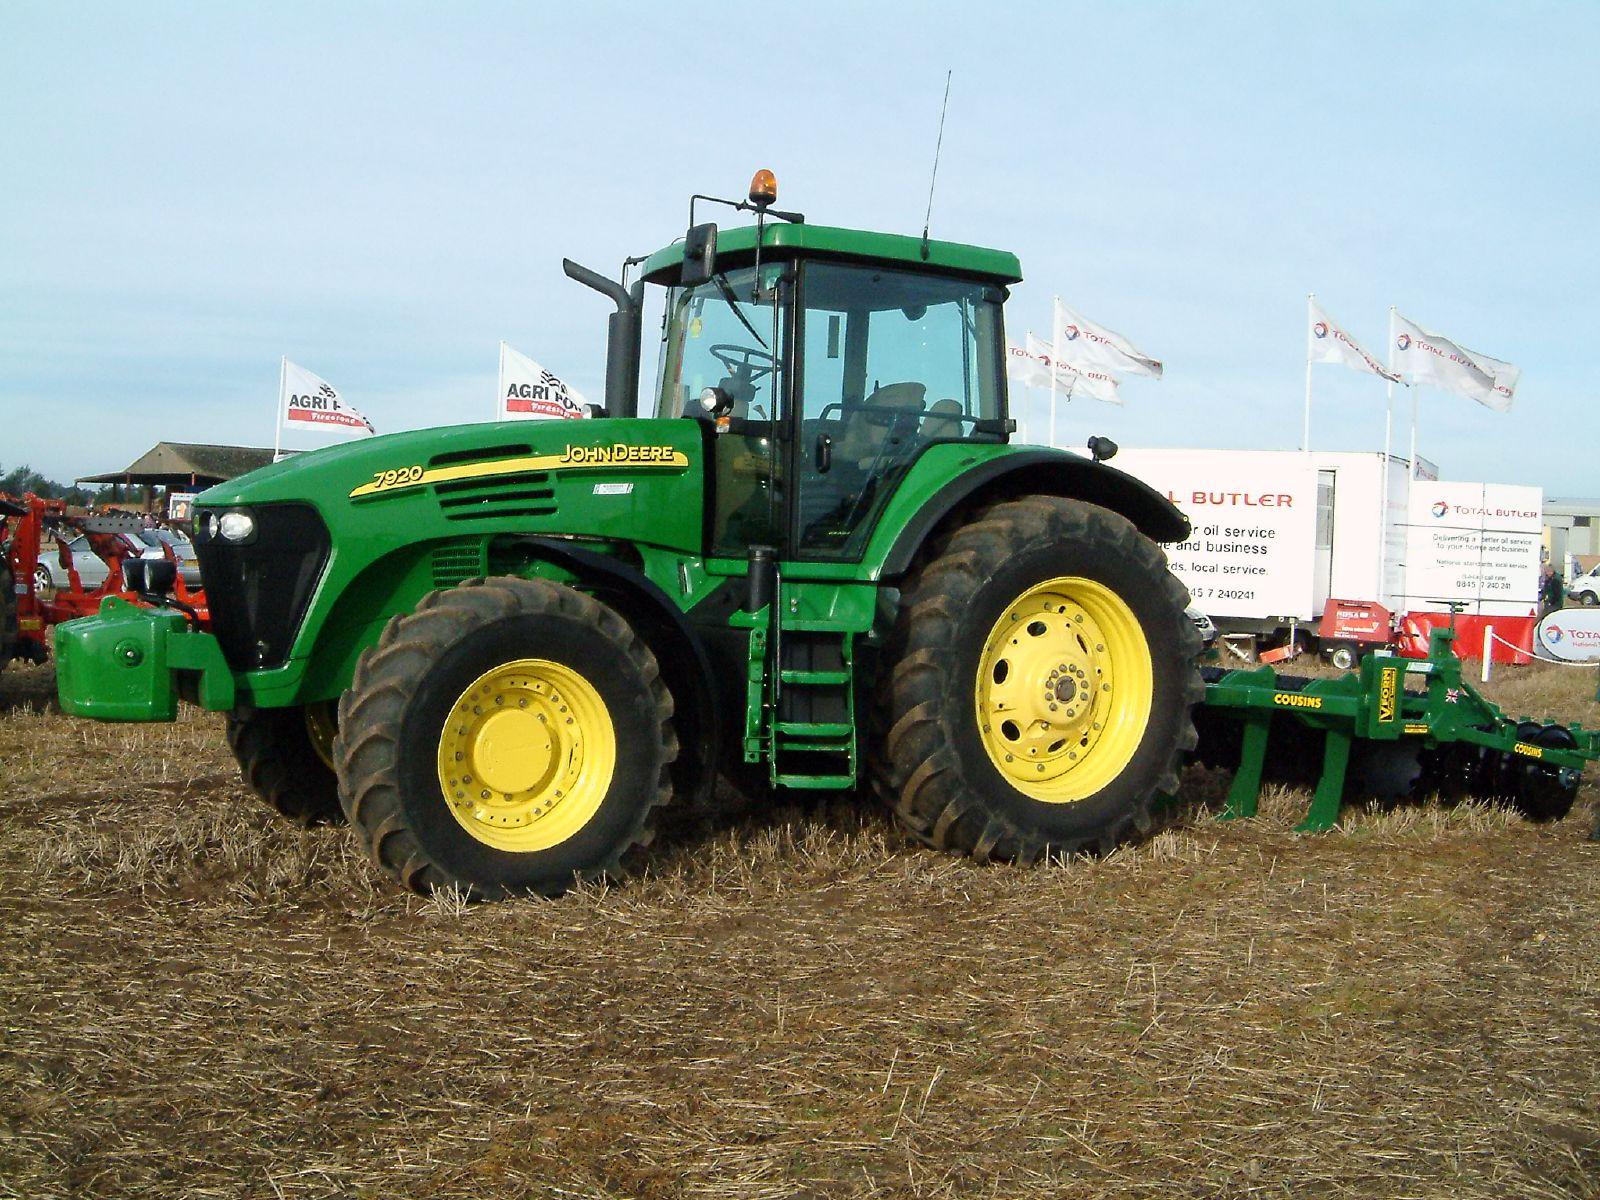 File:John Deere 7920 tractor.jpg - Wikimedia Commons